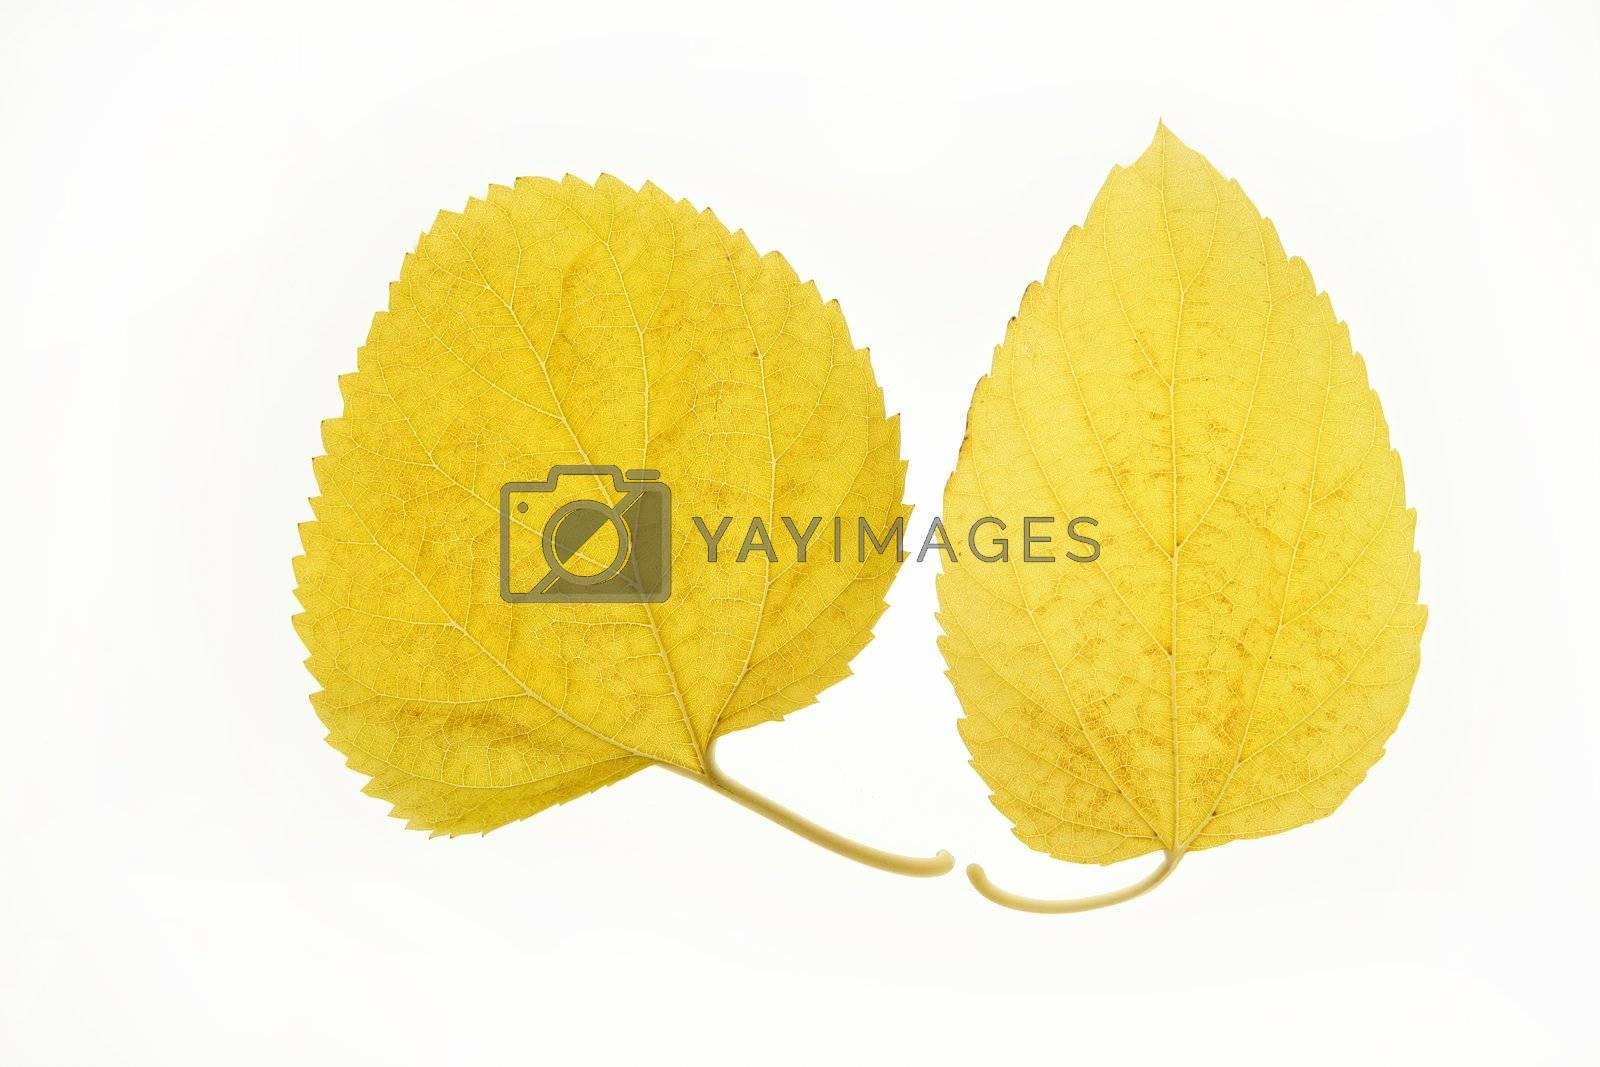 Royalty free image of Autumn, fall leaves decorative still at studio white background by lunamarina